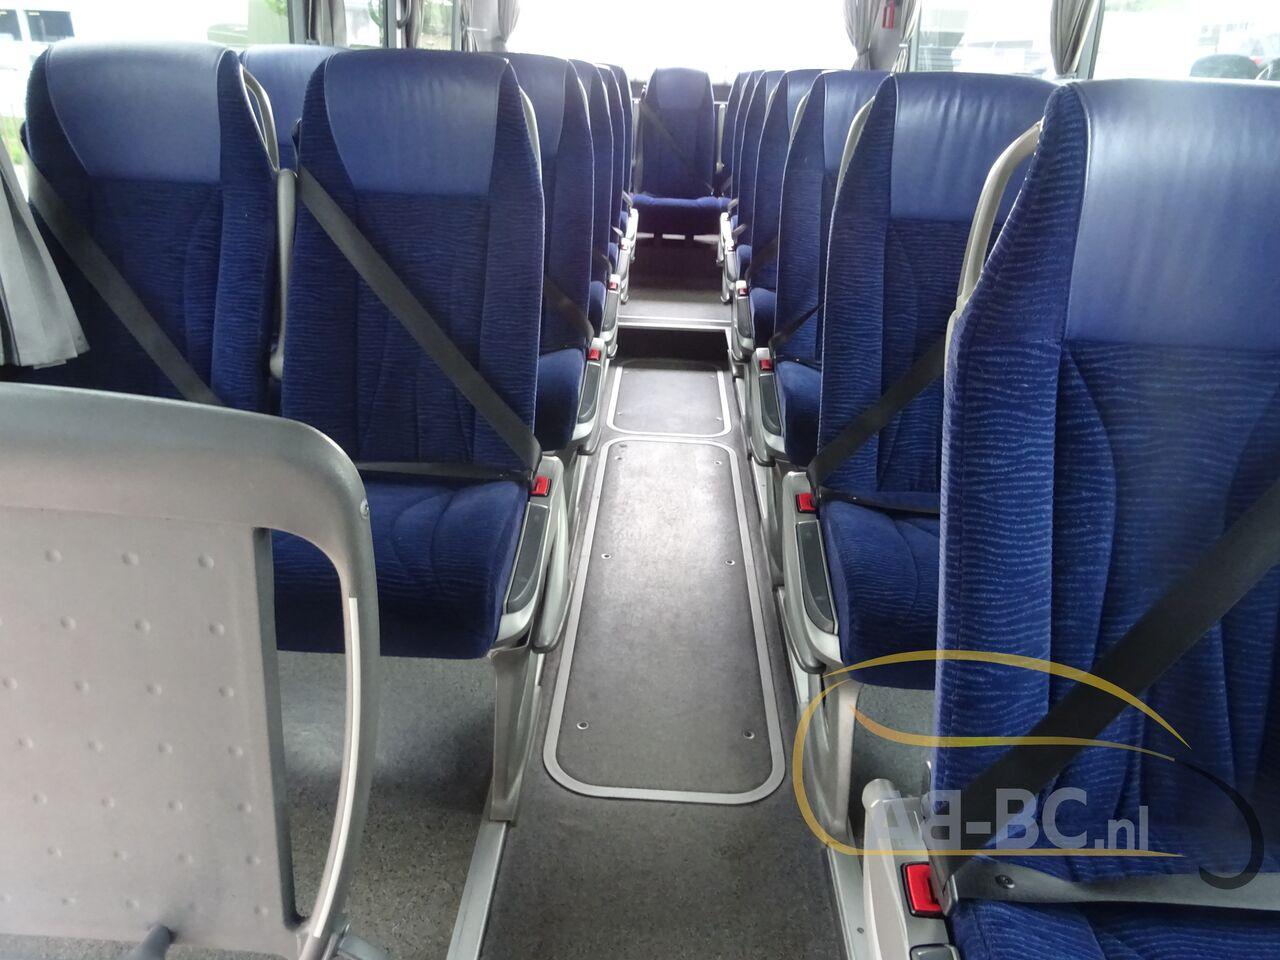 coach-busSETRA-S415-GT-HD-FINAL-EDITION---1627457244113465439_big_146f6c8a36af35cdde00897146dc9975--21050713010665719300